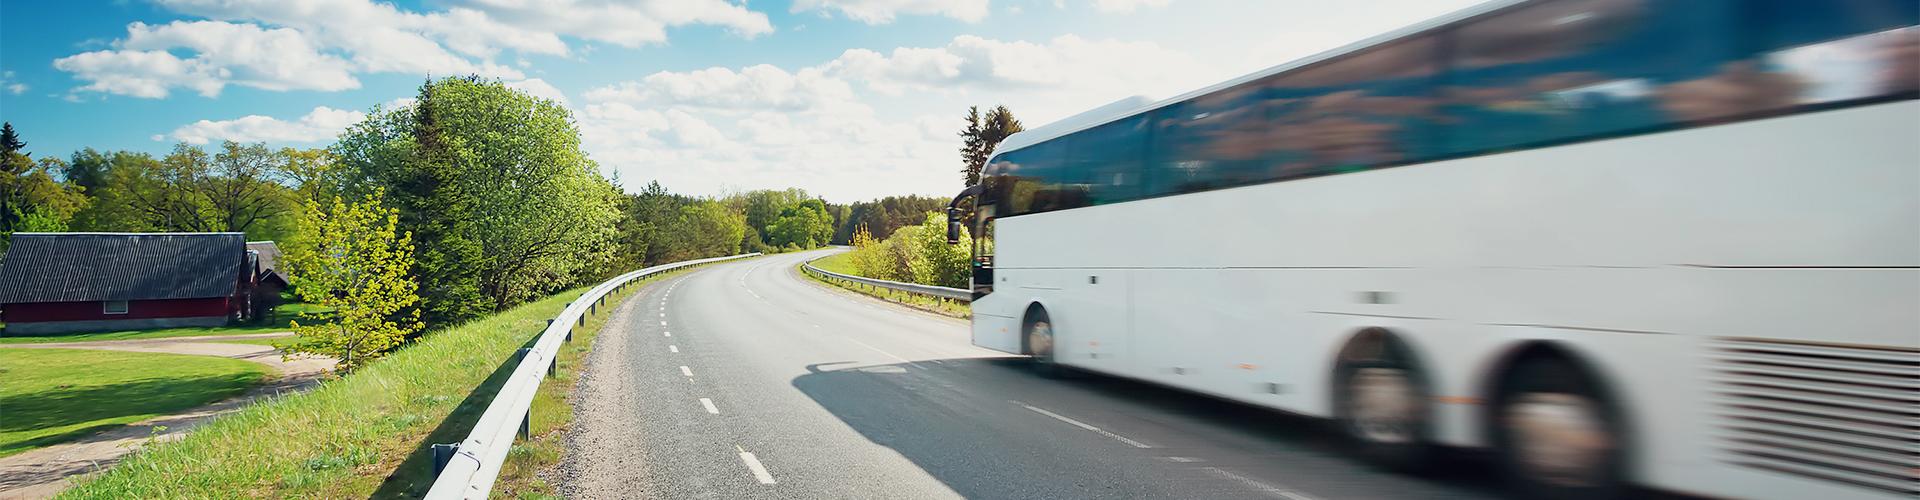 dcf500f1f0ce Hyra buss | Hyra Buss Uppsala